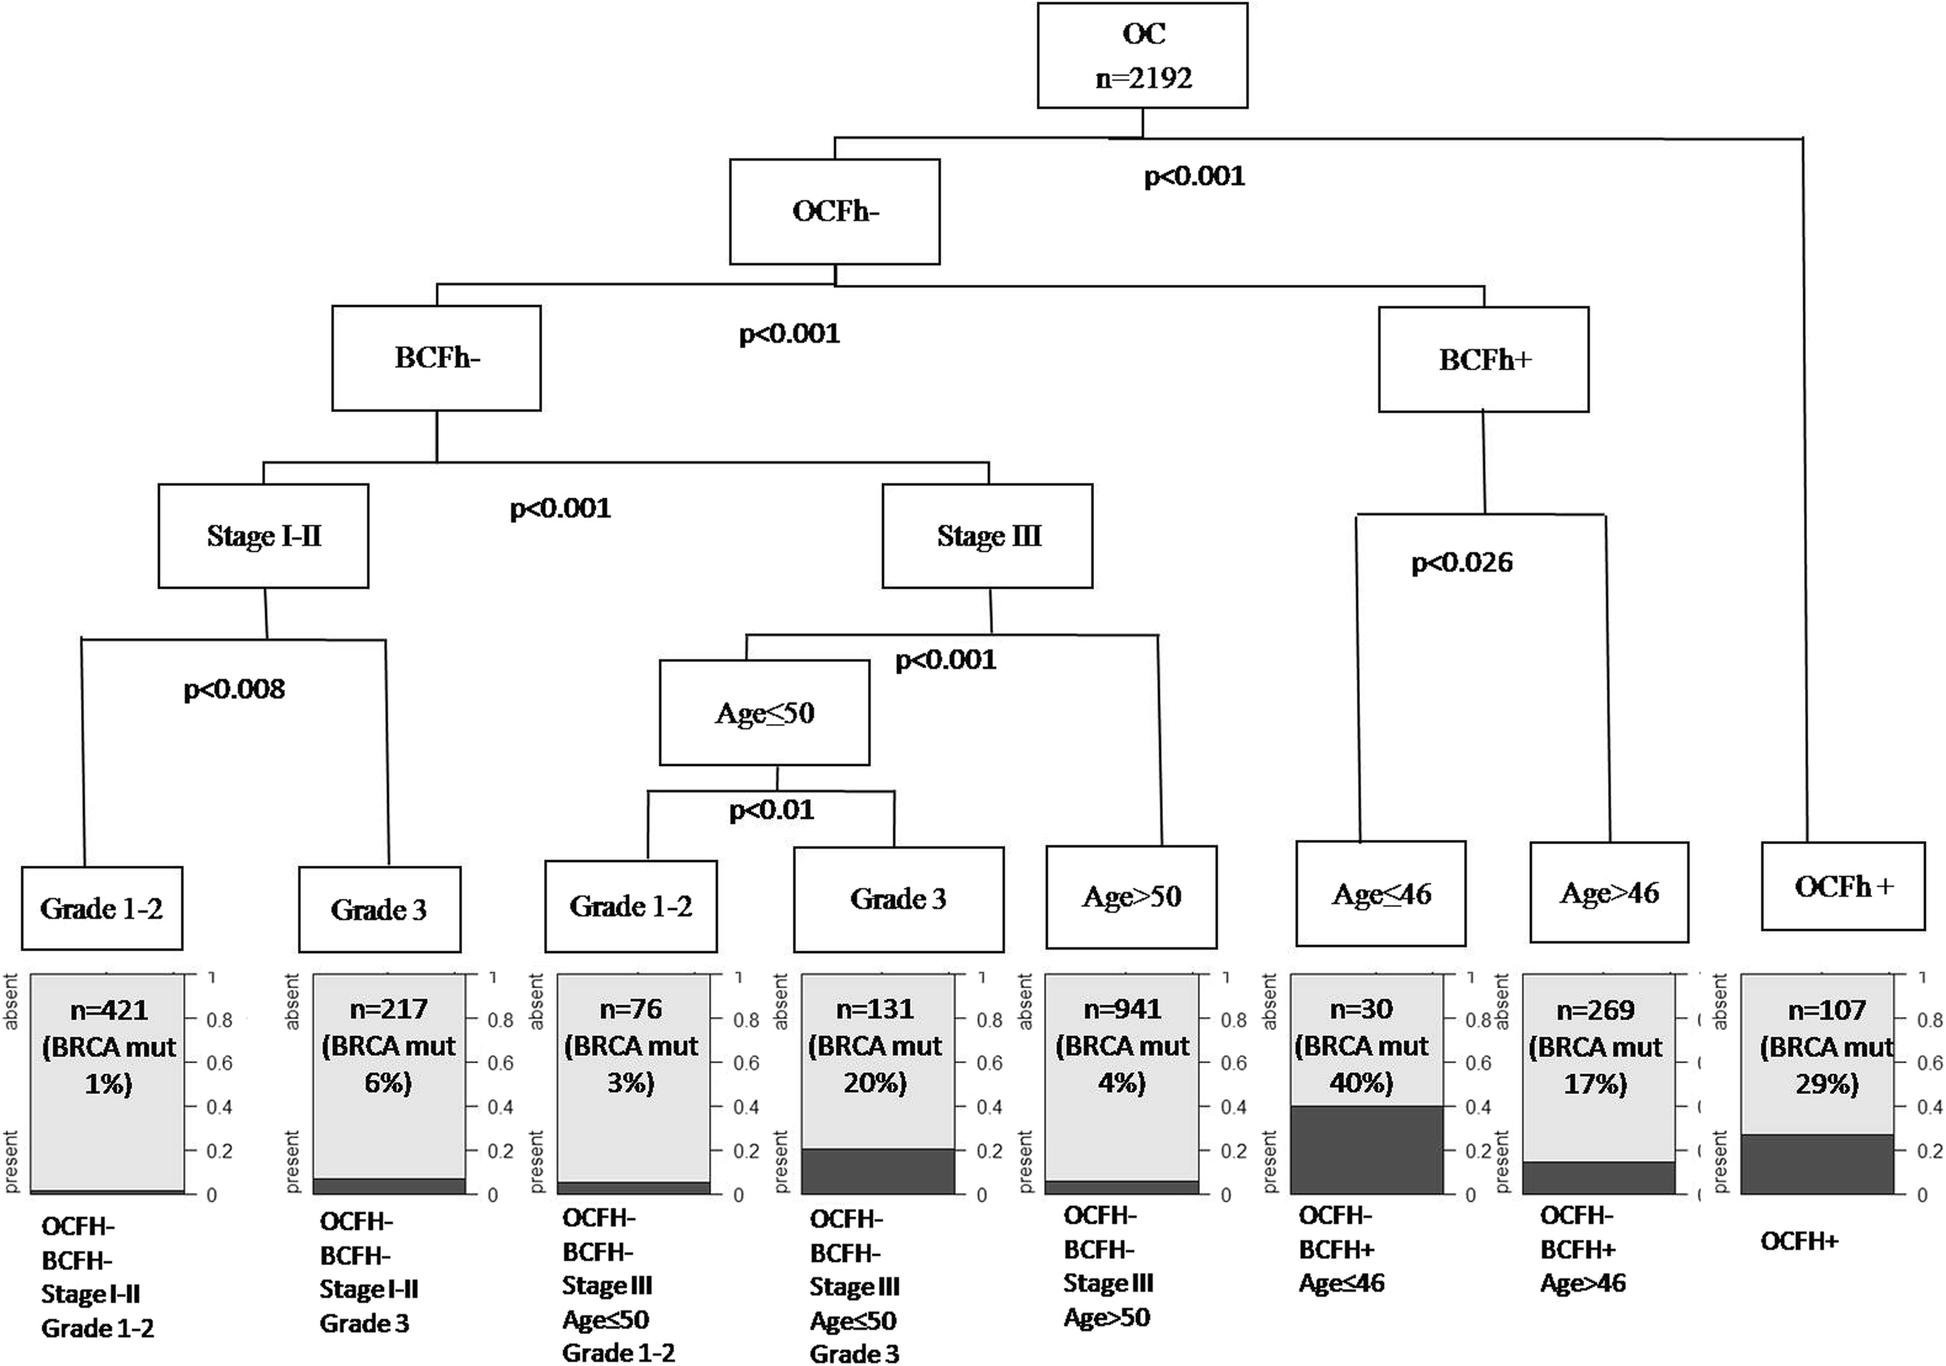 Brca Germline Mutation Test For All Woman With Ovarian Cancer Bmc Cancer Full Text